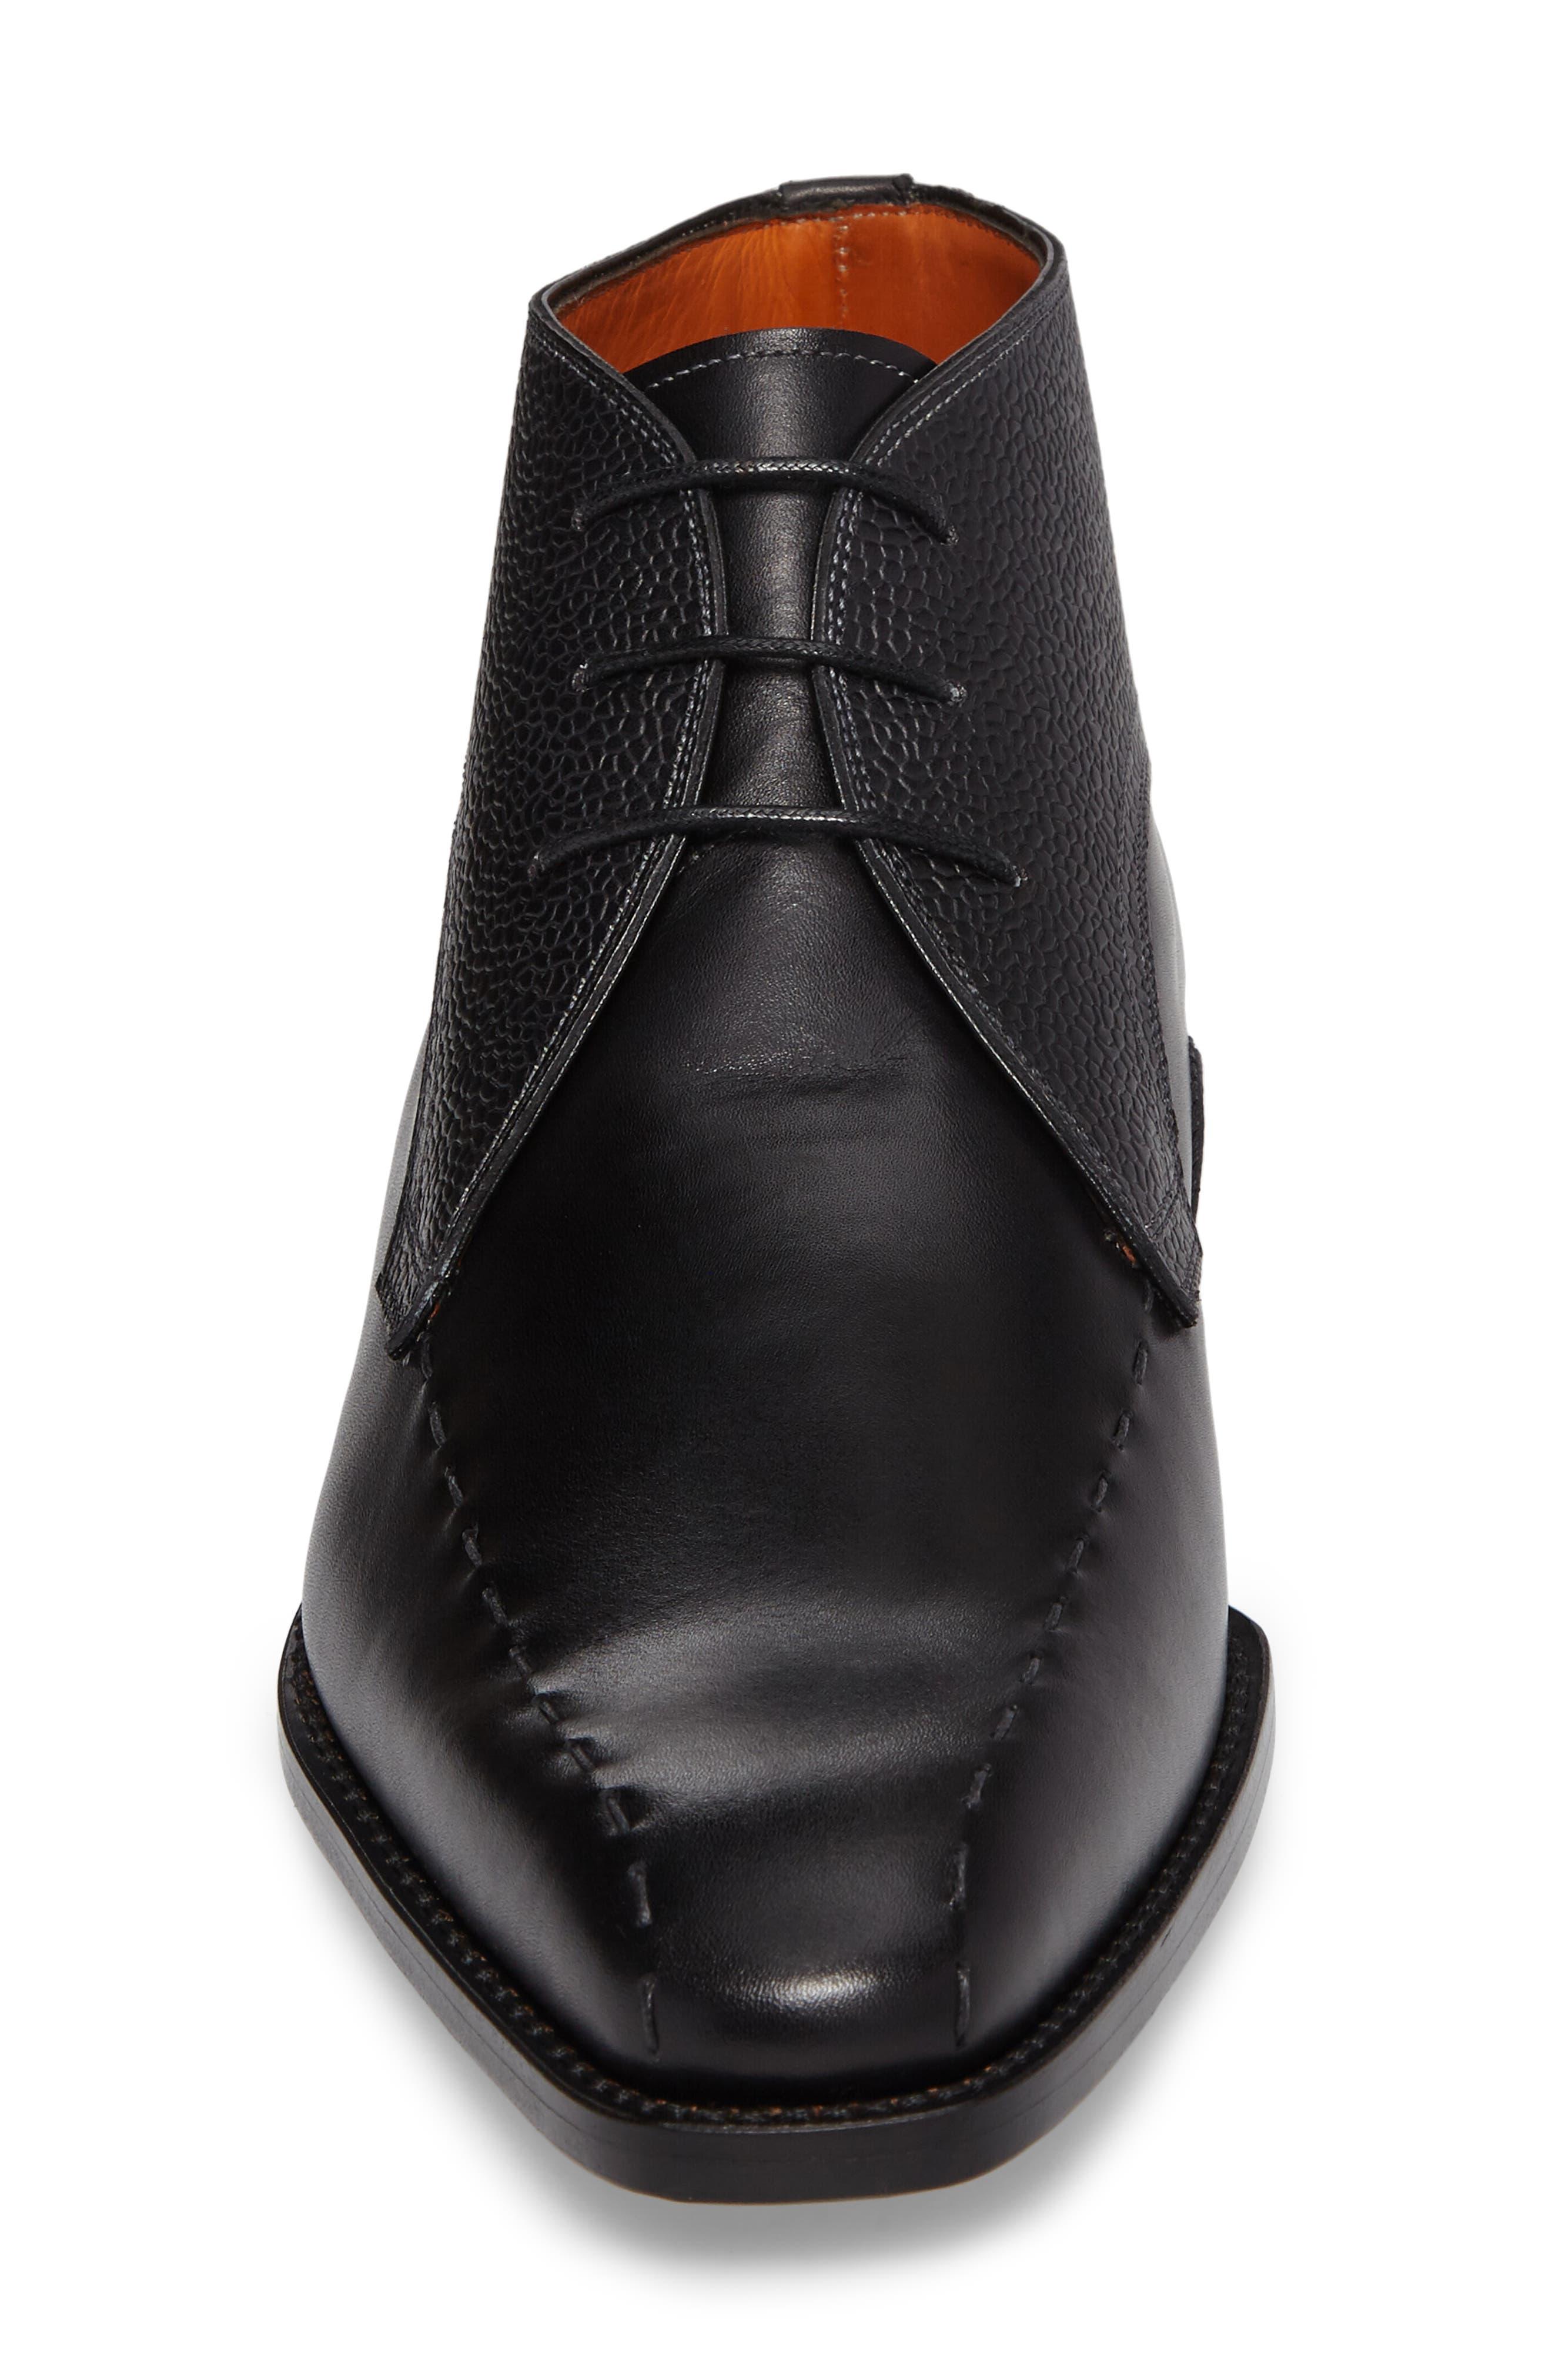 Moriles Chukka Boot,                             Alternate thumbnail 4, color,                             Black Leather